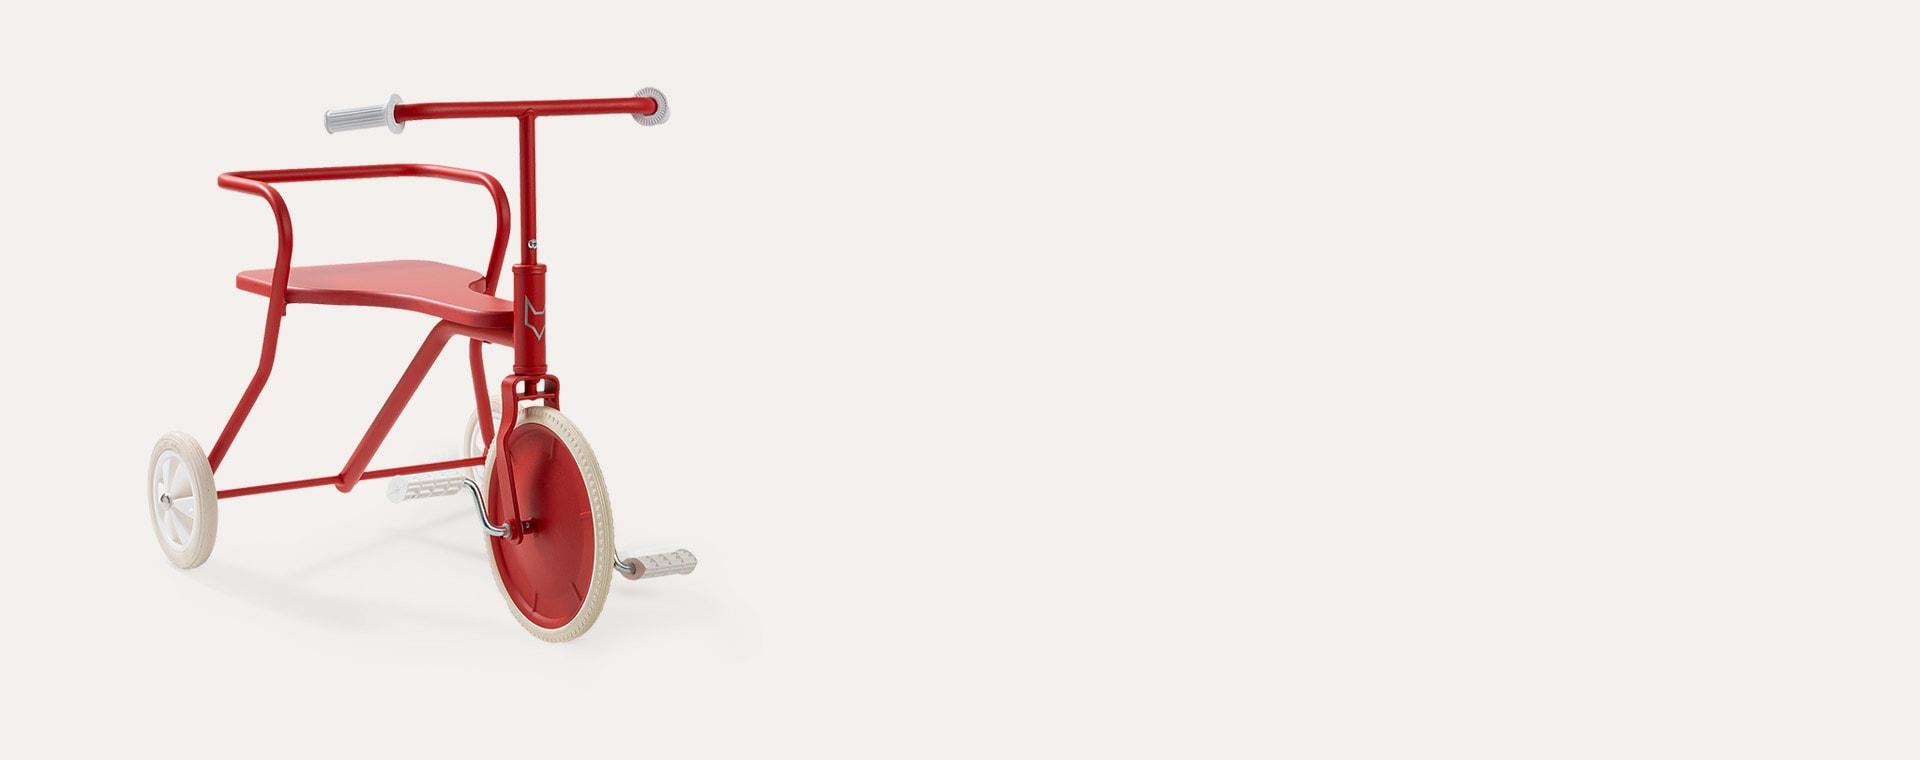 Red Foxrider Retro Tricycle